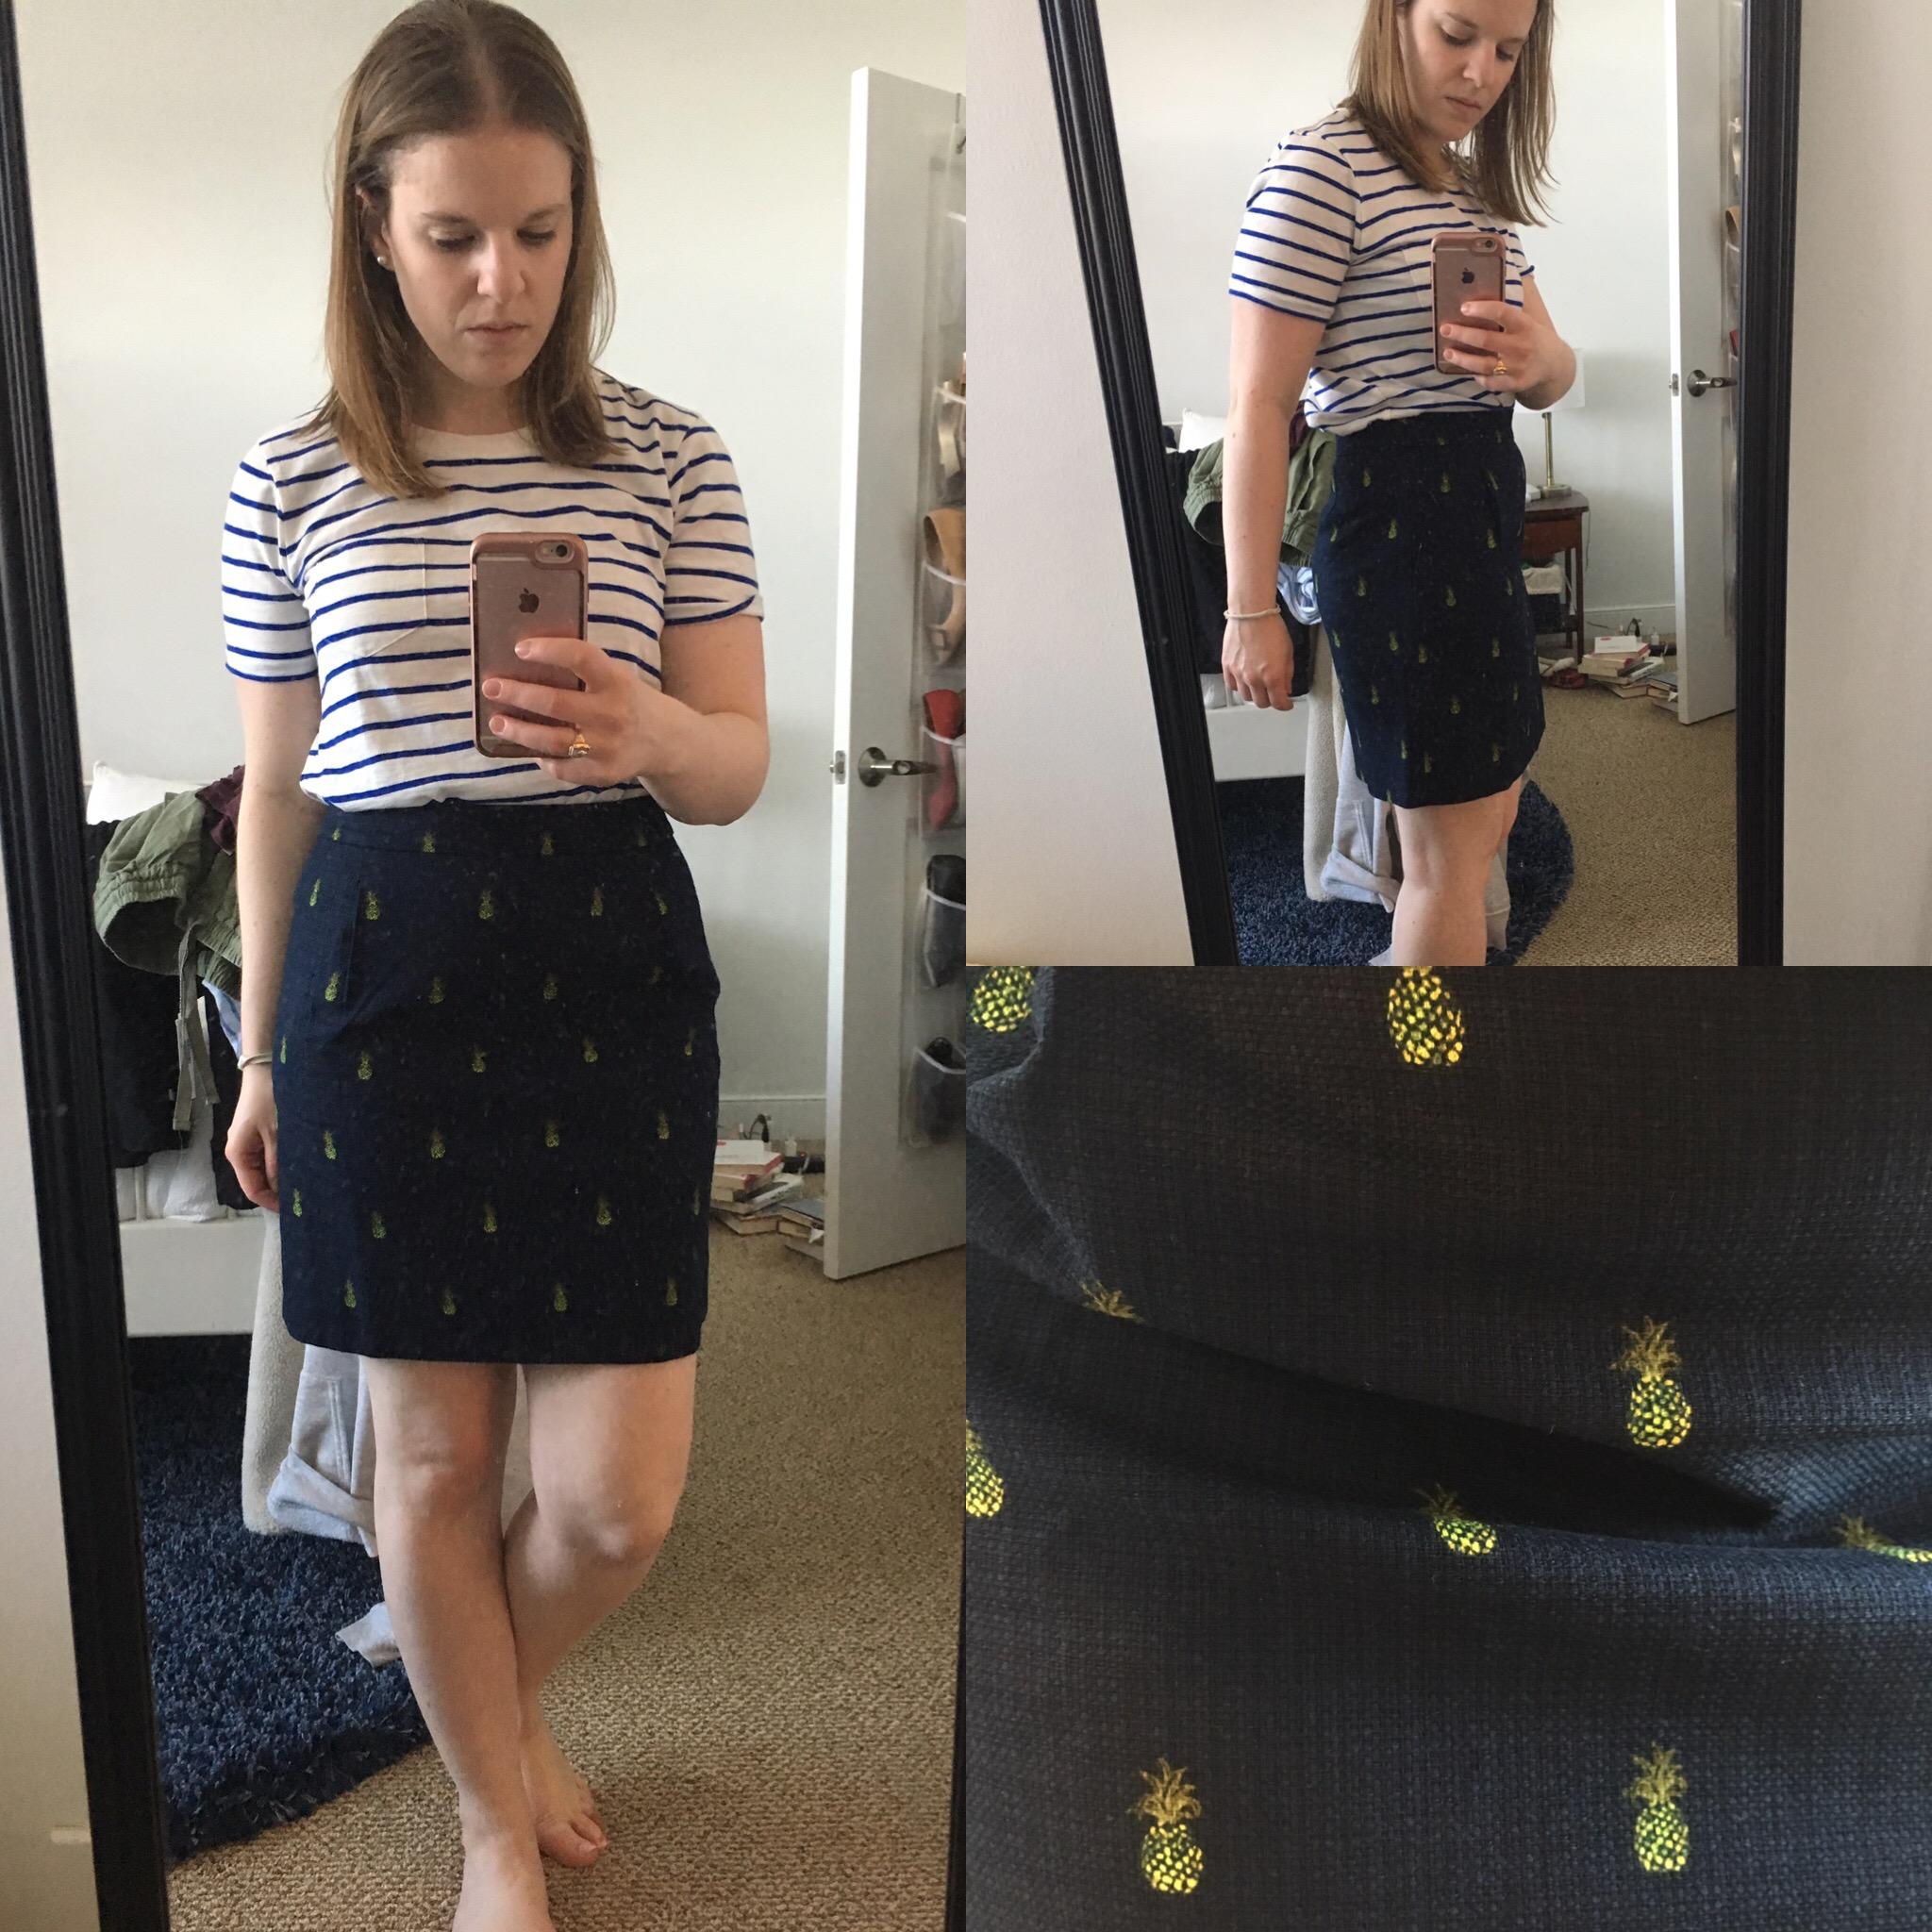 01ae70d4b3 Shopping Reviews, Vol. 43 | Something Good | A Style Blog on a ...